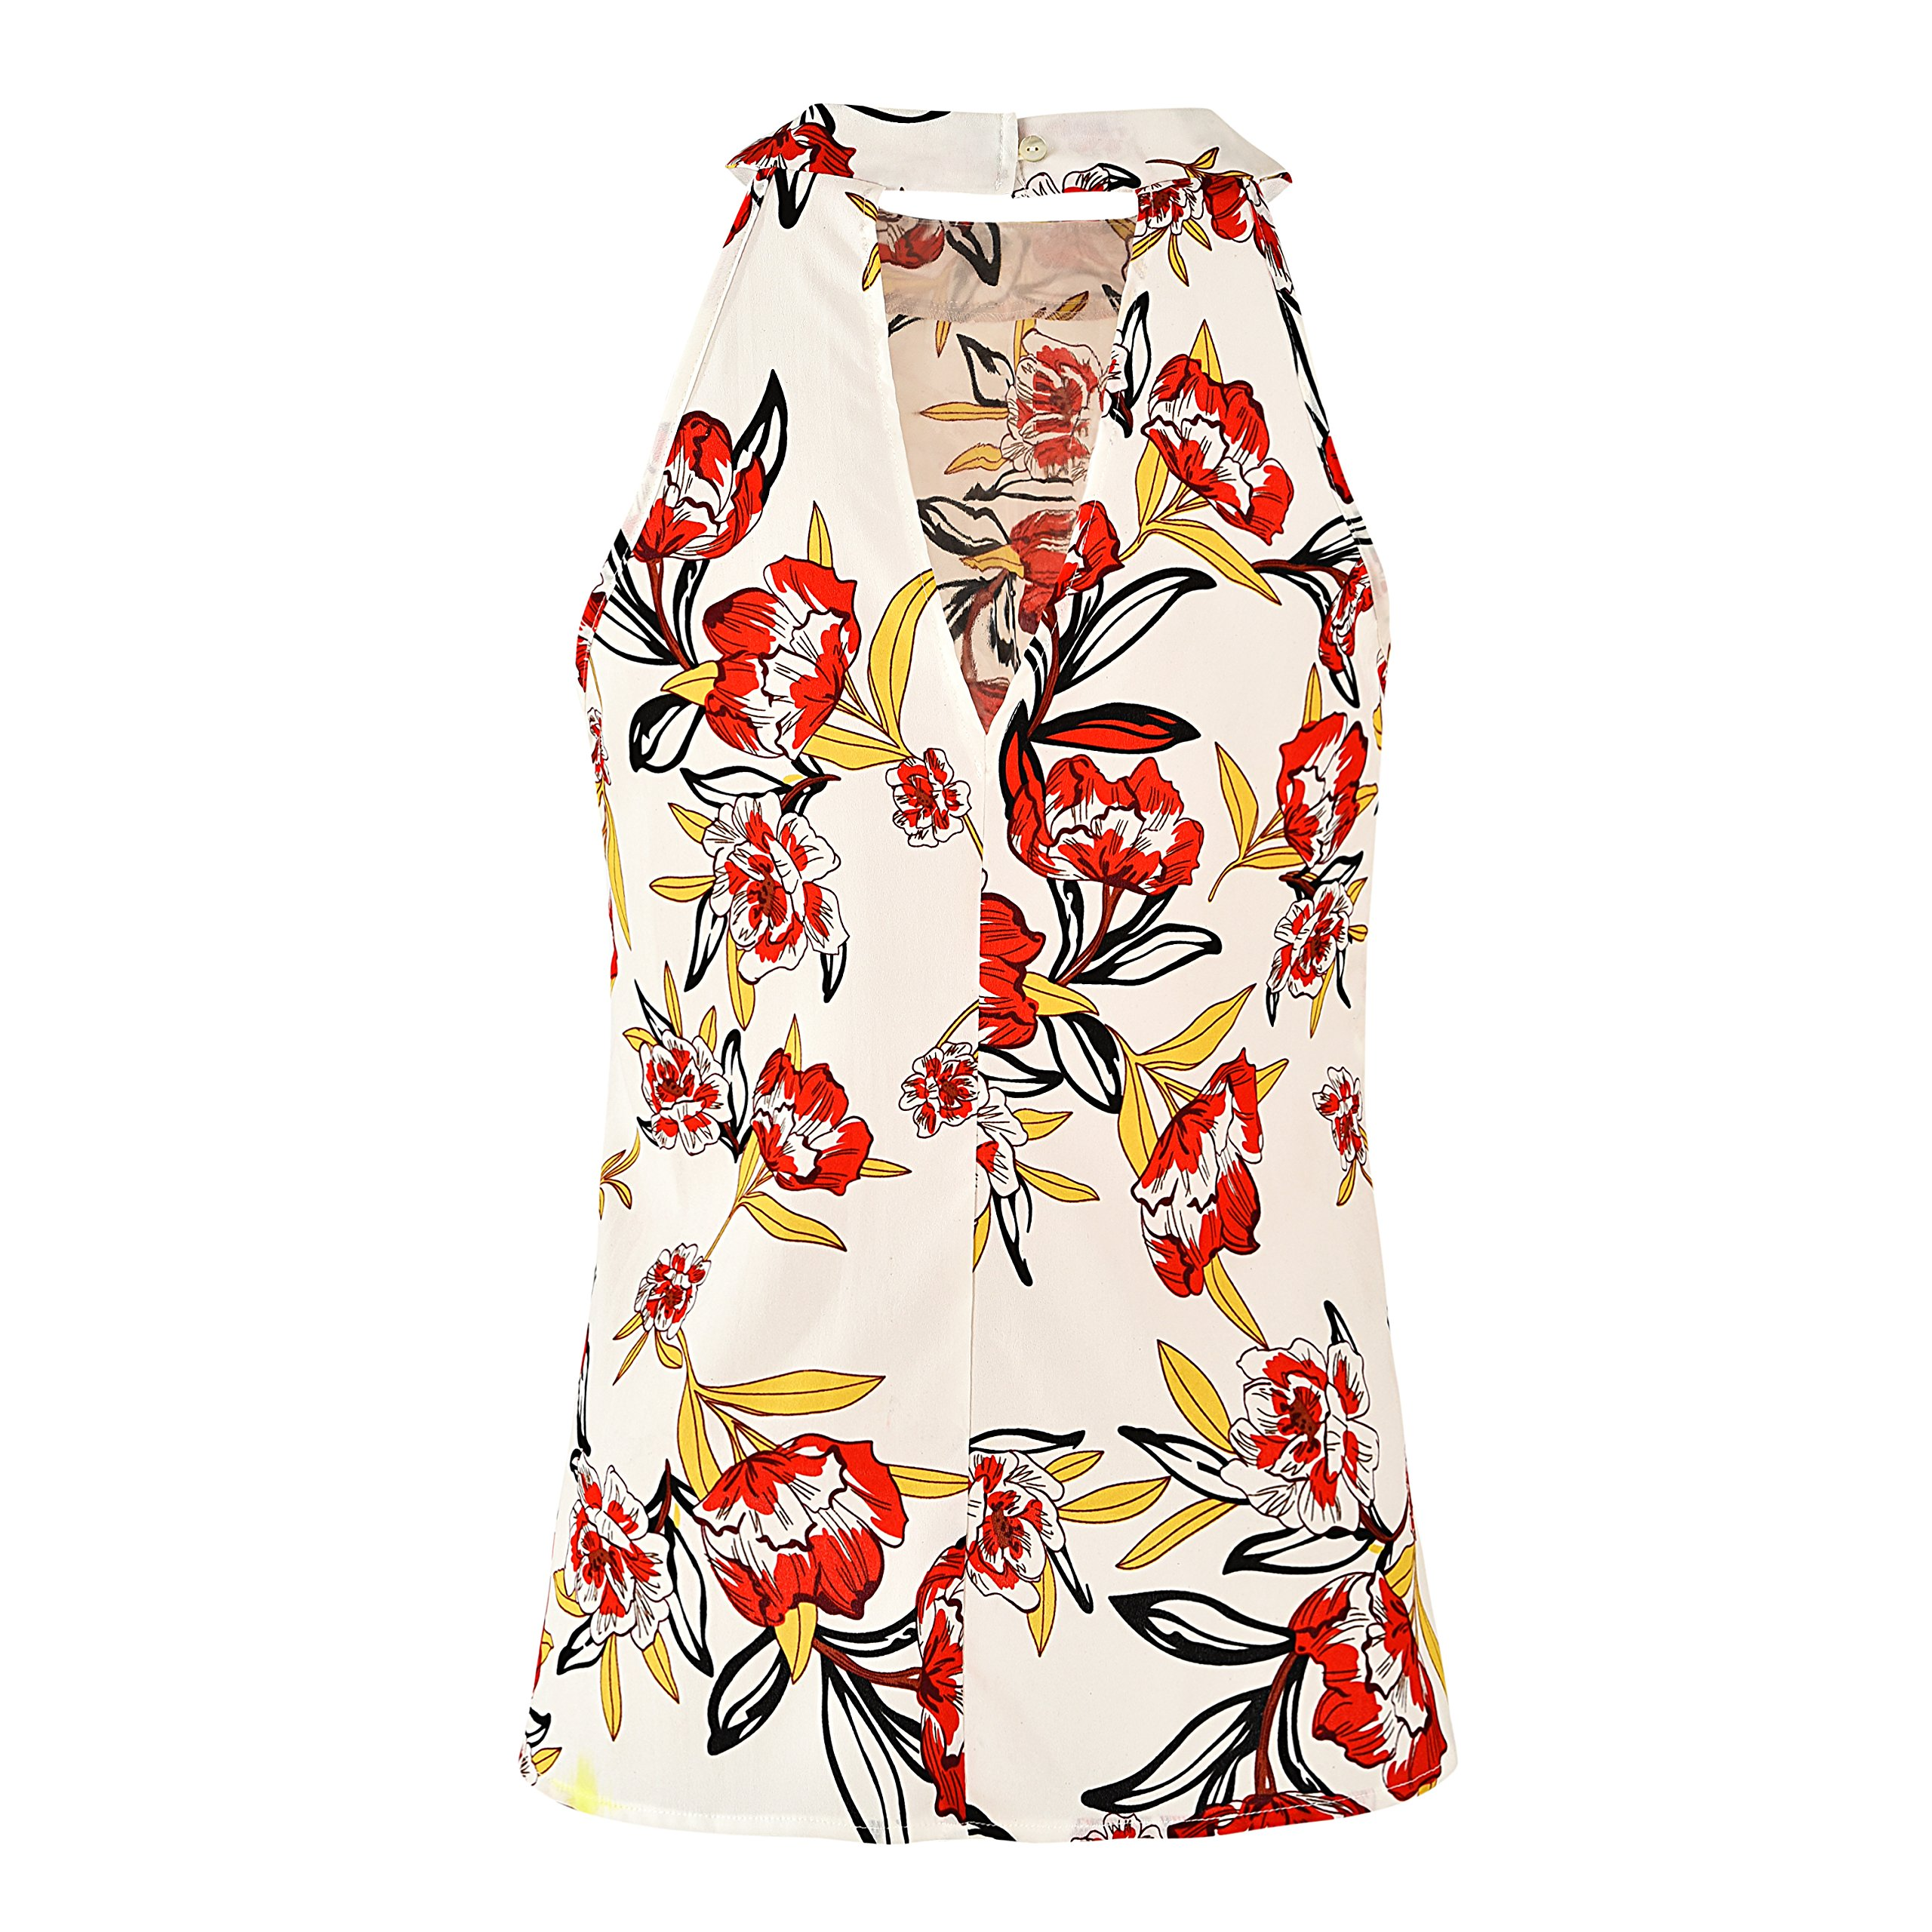 Comcrib Womens Casual Floral Printed Sleeveless Vest Shirt, Ladies Tank Top Blouse Tunic Tops Summer Beachwear T-Shirt by Comcrib (Image #3)